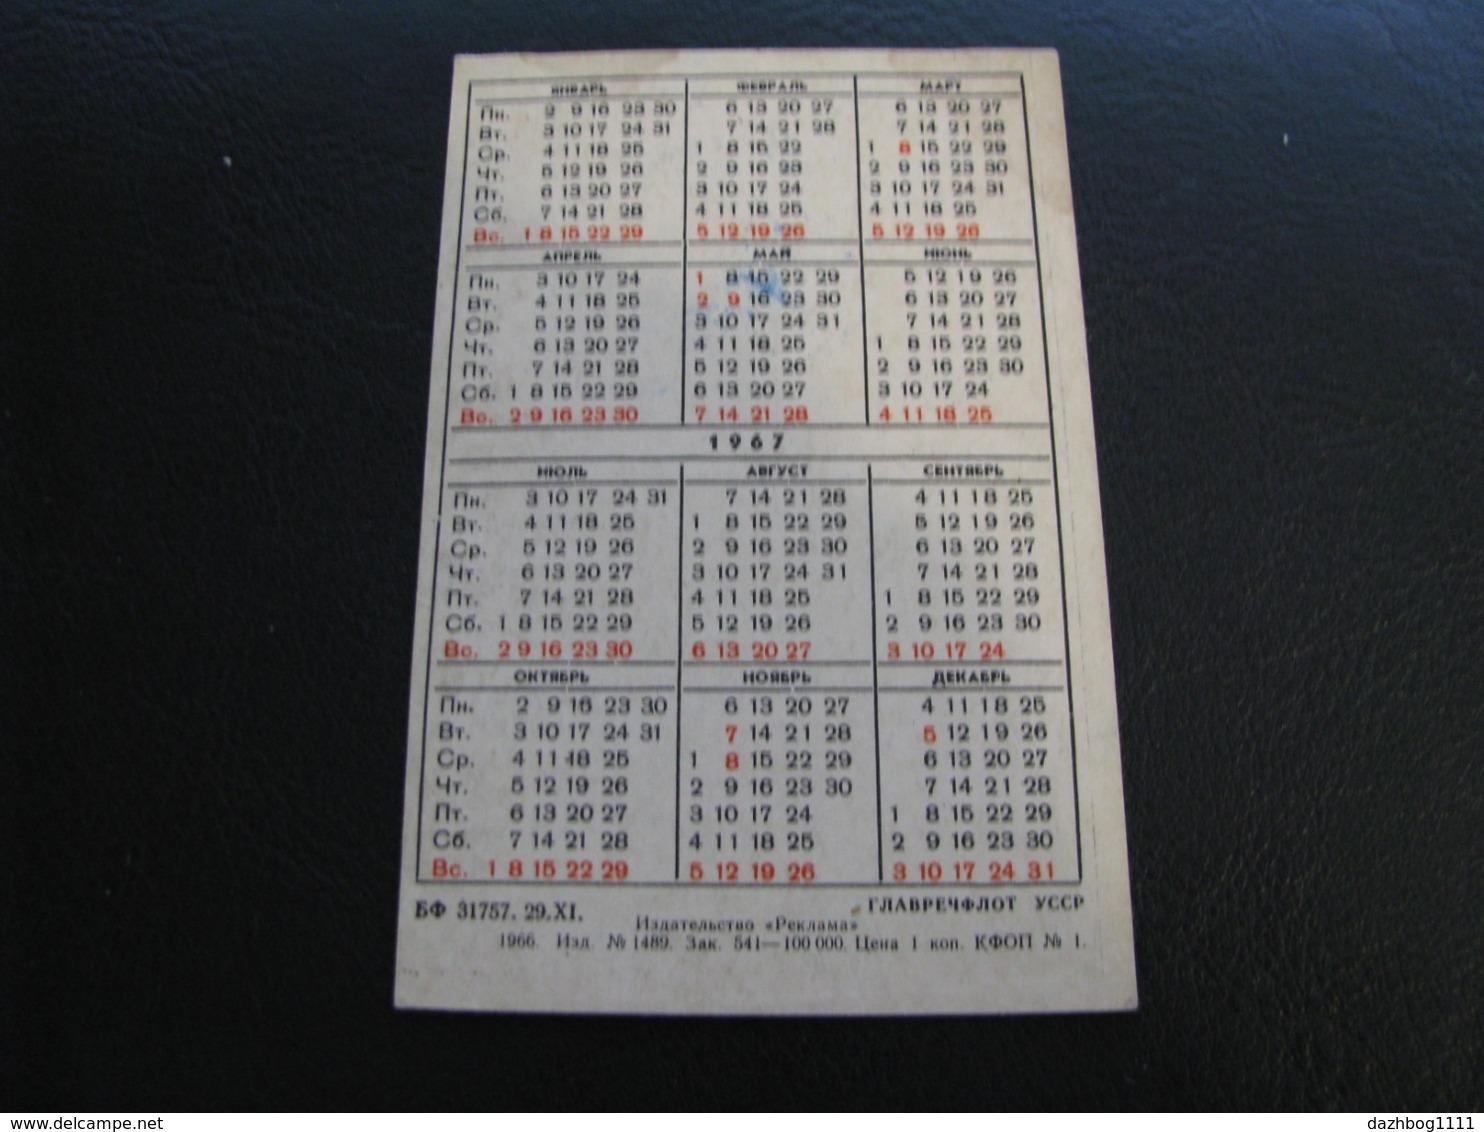 USSR Soviet Russia  Pocket Calendar Travels On The Dnieper Glavrechflot Of The Ukrainian SSR Ship 1967 - Calendars